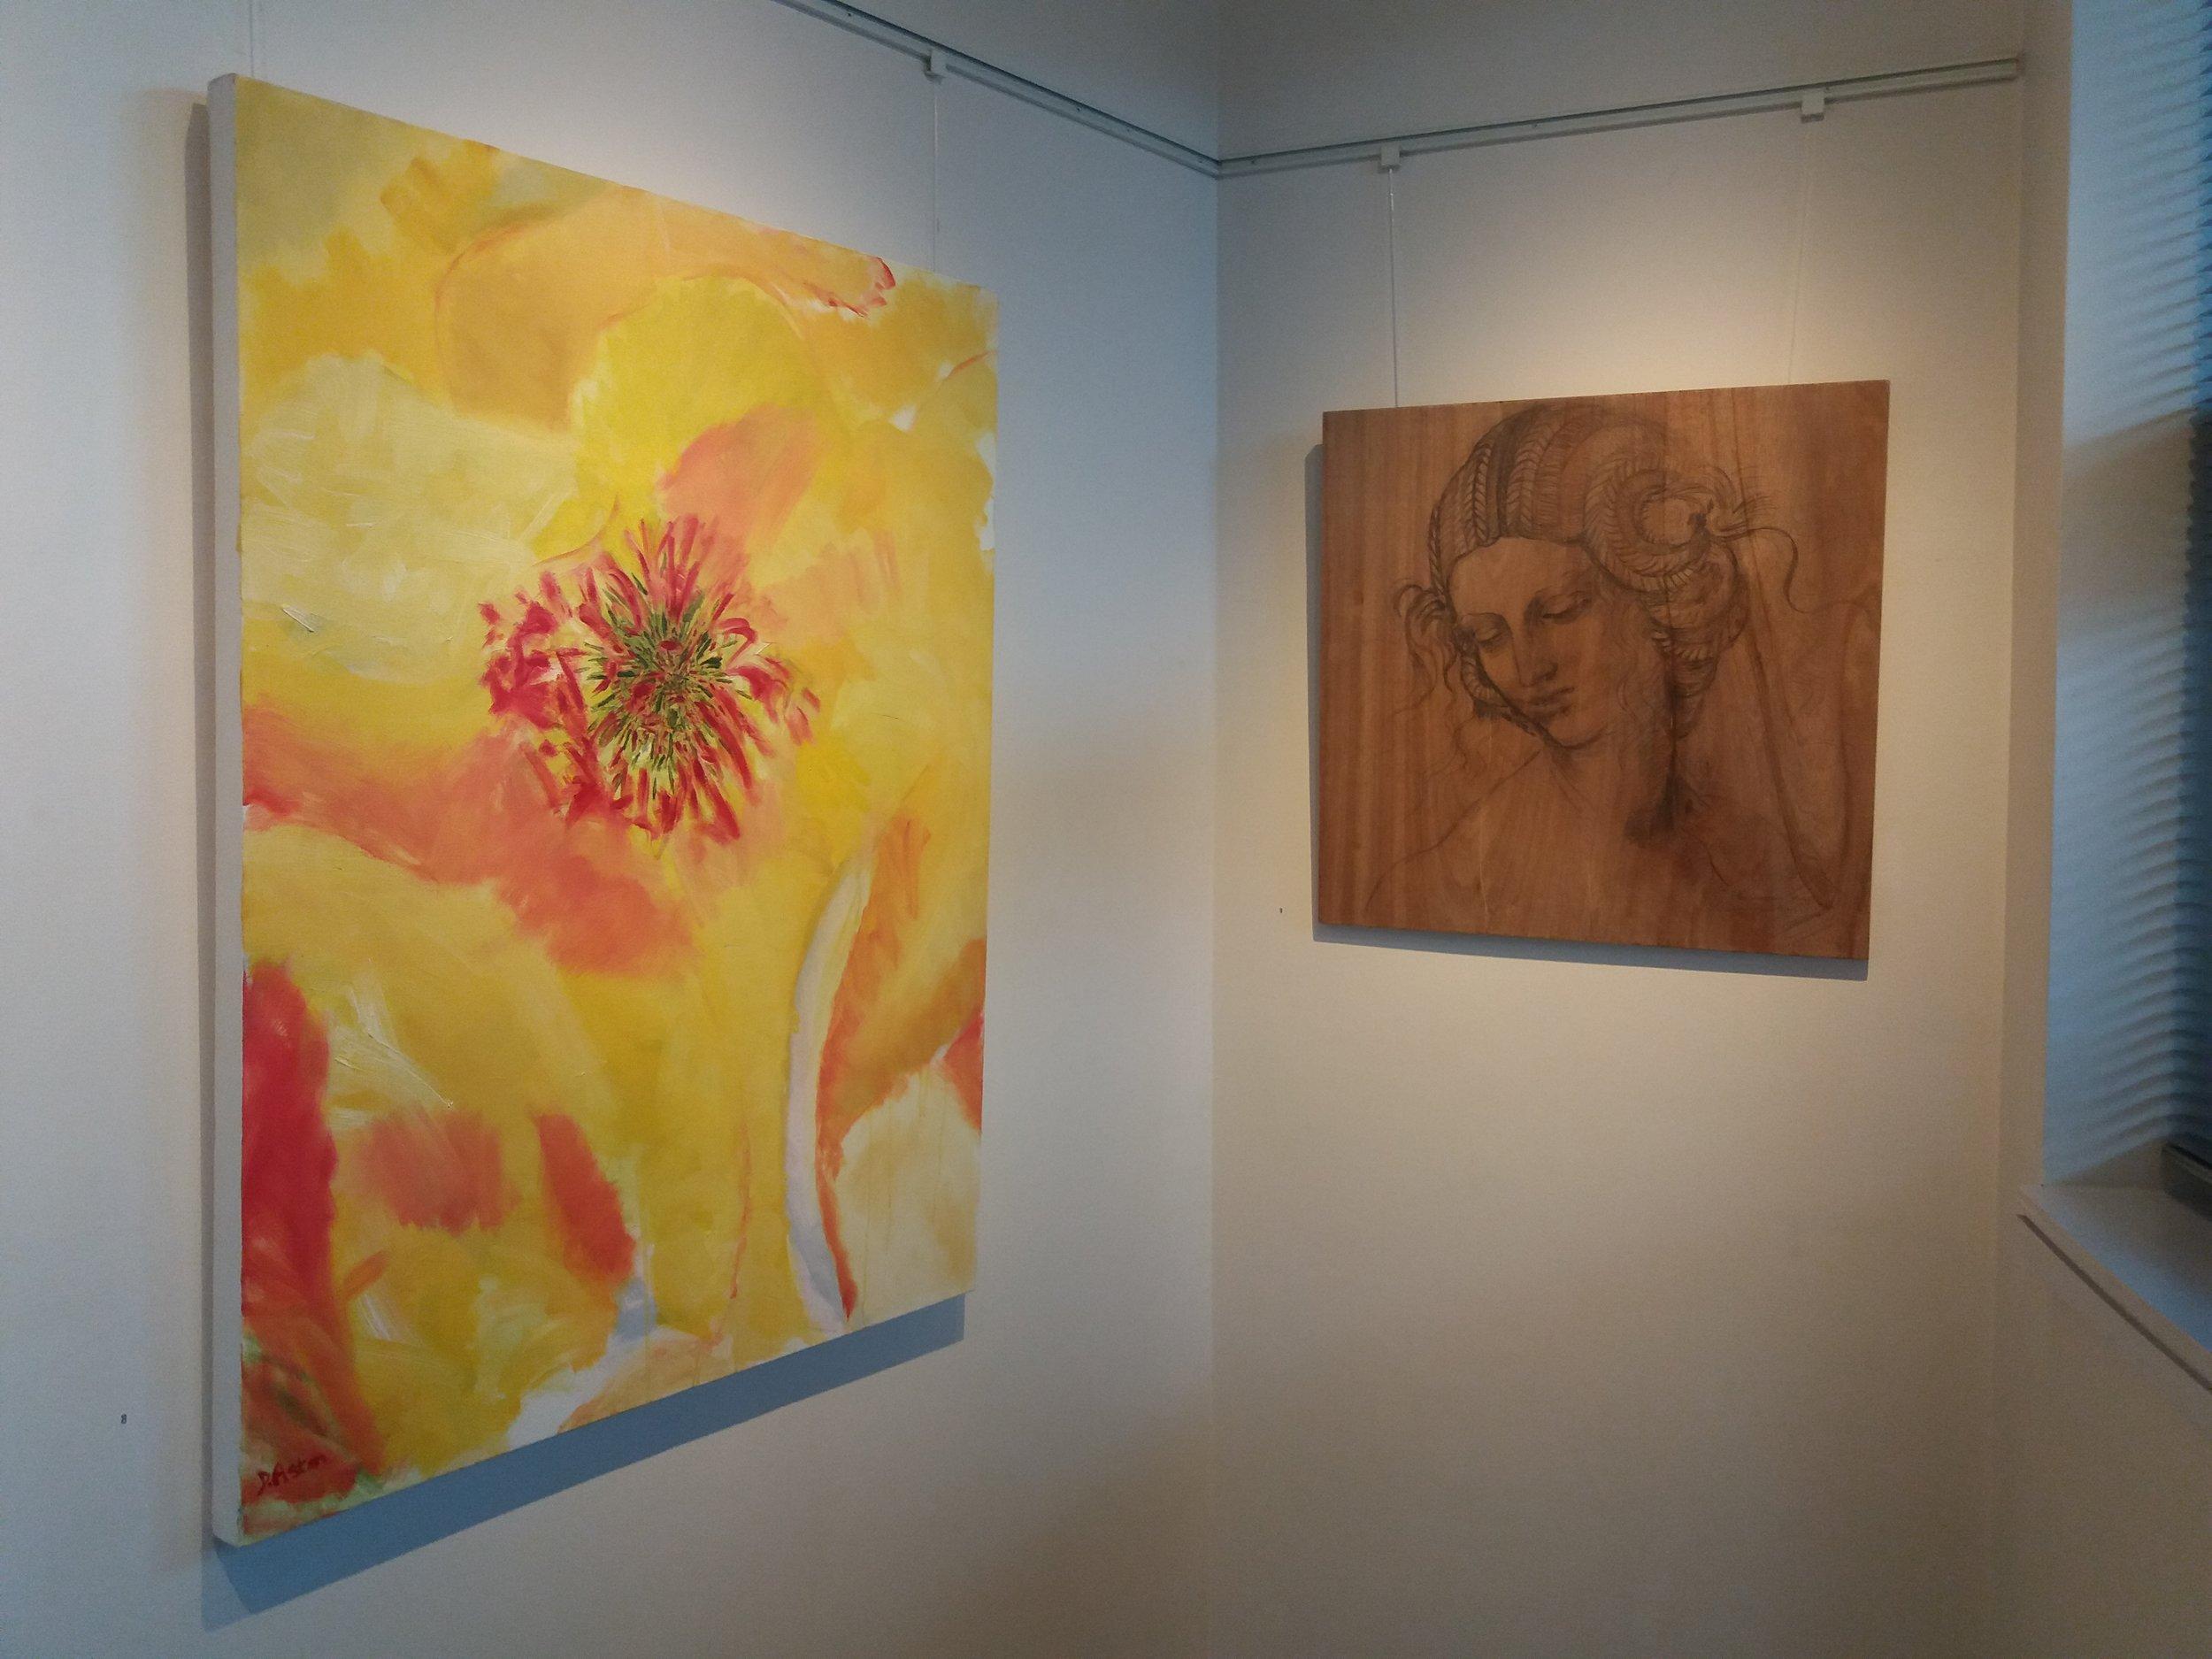 'Maigold' painting  'After Leonardo' drawing on wood